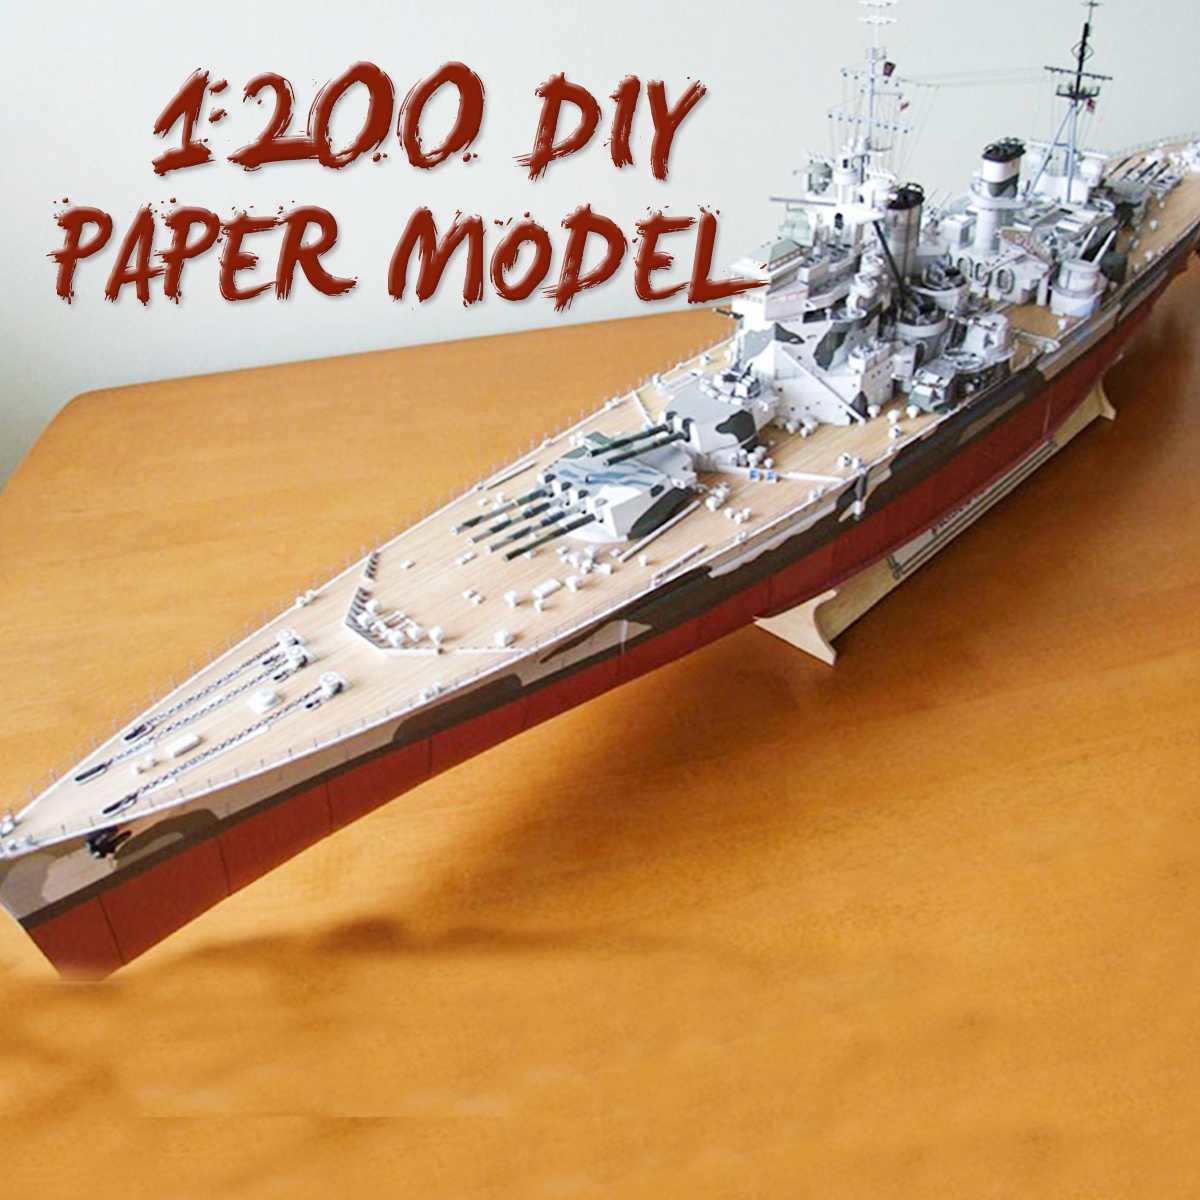 1:200 1/200 Battleship DIY Large 3D Paper Military Model Ship British Battleships Of Wales Ship Toy Children Gifts Handcraft